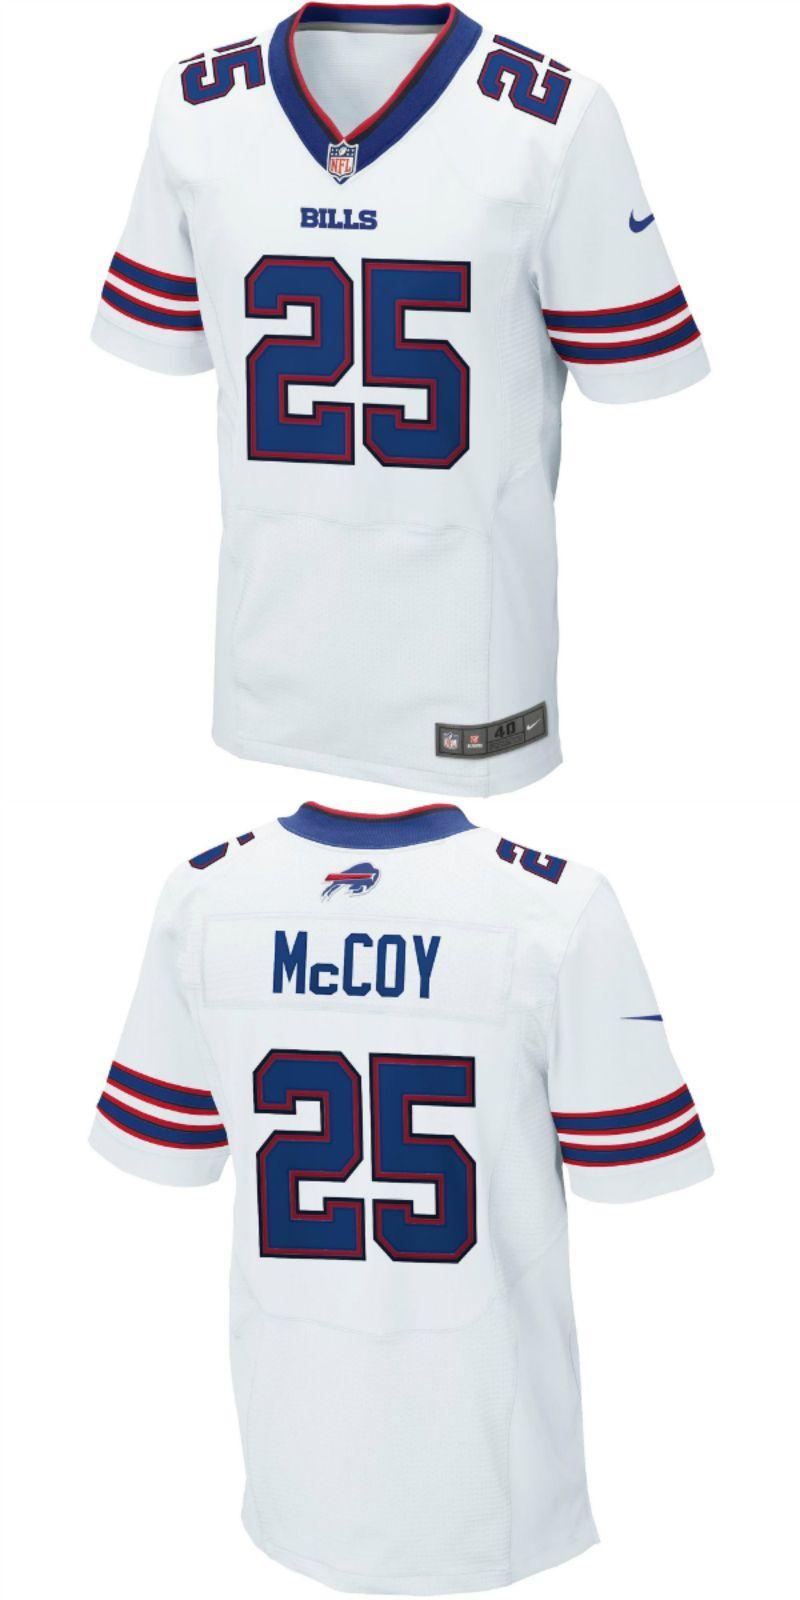 2a2154a1a155e LeSean McCoy Buffalo Bills Nike Elite Jersey White. Up to 70& off ...